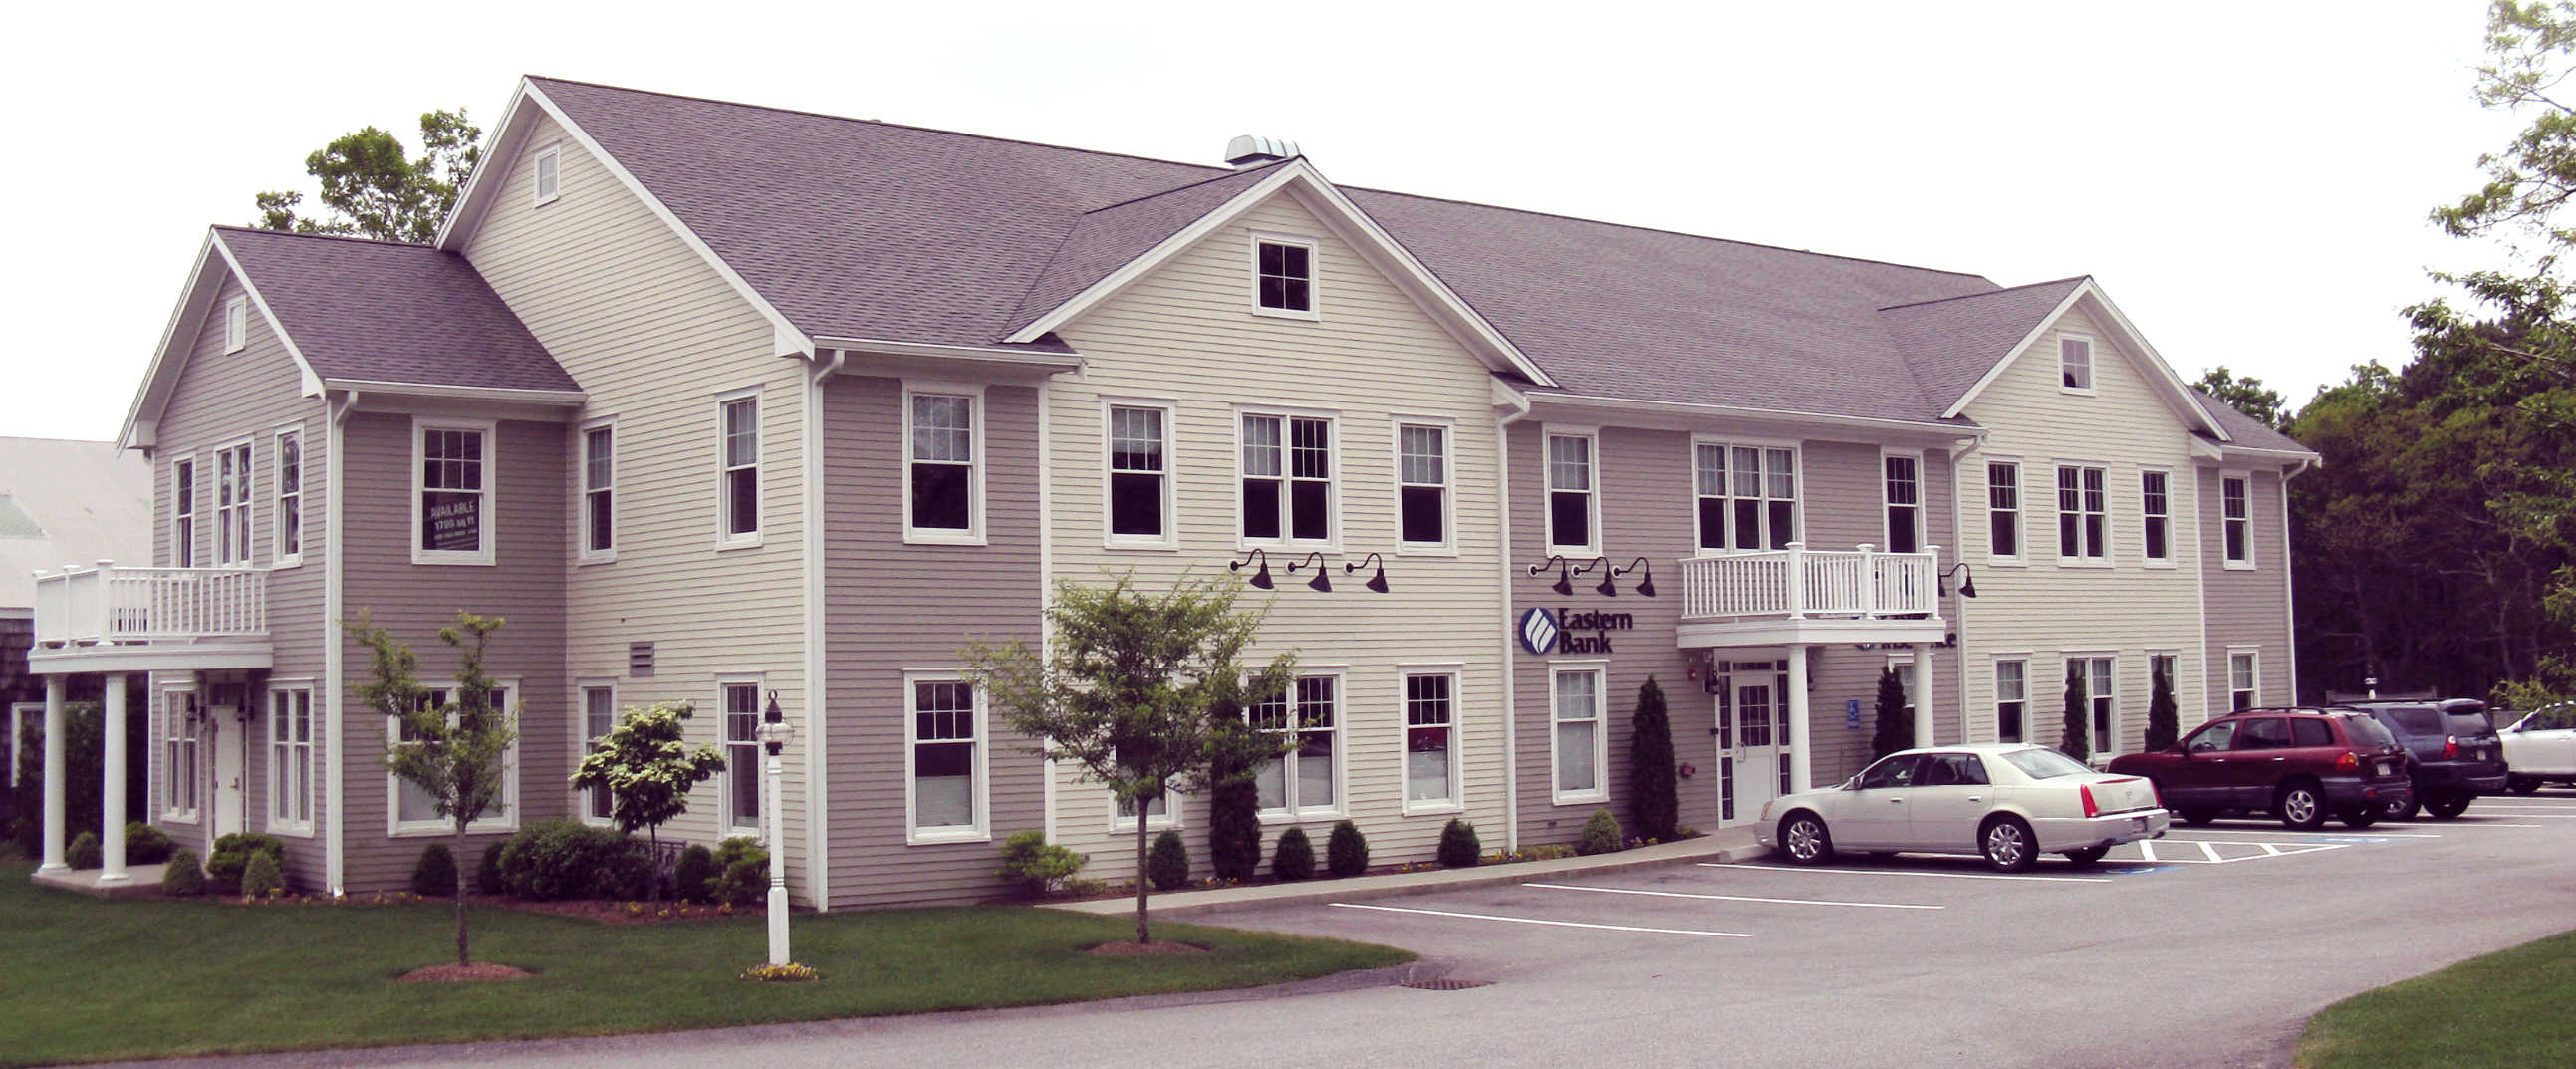 Cape Cod Real Estate Camp Cod Homes For Sale Davenport